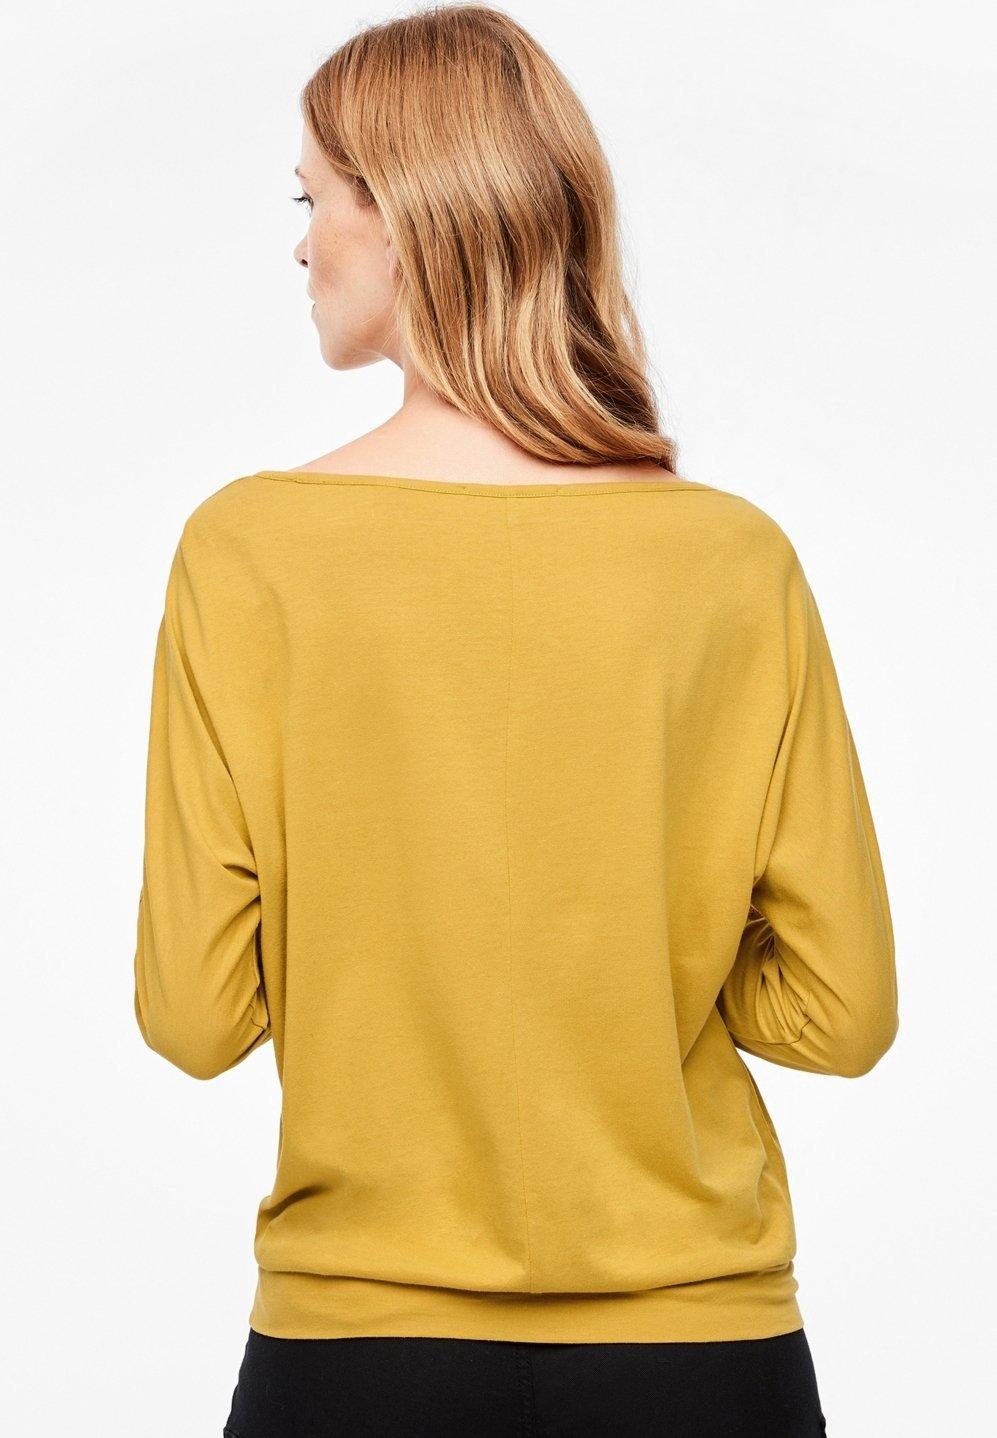 S.oliver Langarm - Longsleeve Yellow SkM1e8JY